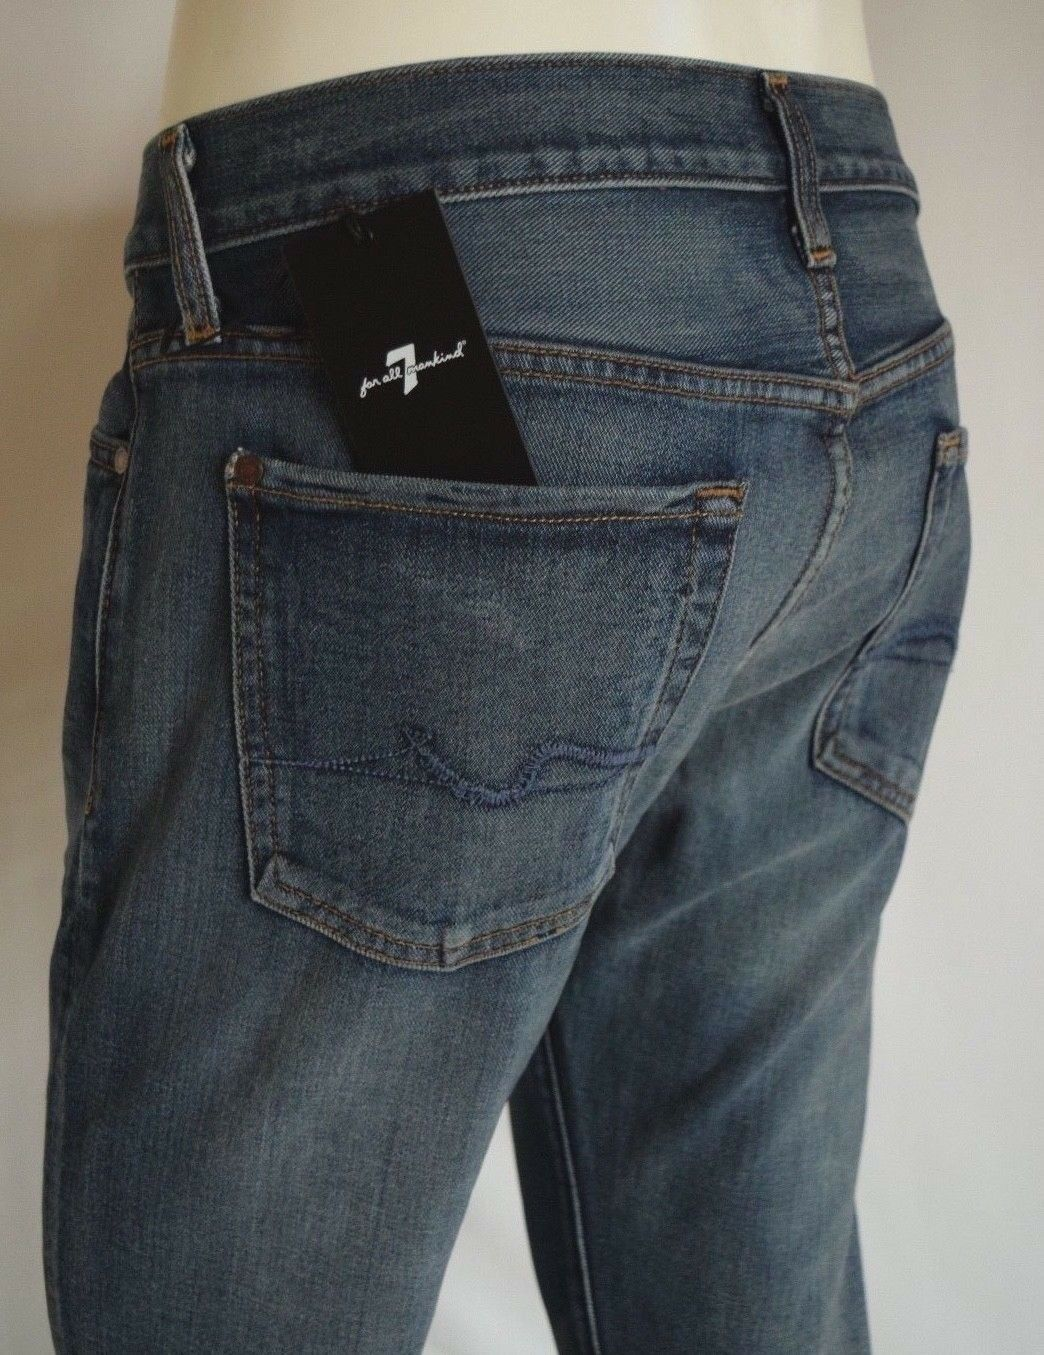 Seven 7 For All Mankind STANDARD STRAIGHT Jeans Men SZ 33 HERITAGE MEDIUM blueE